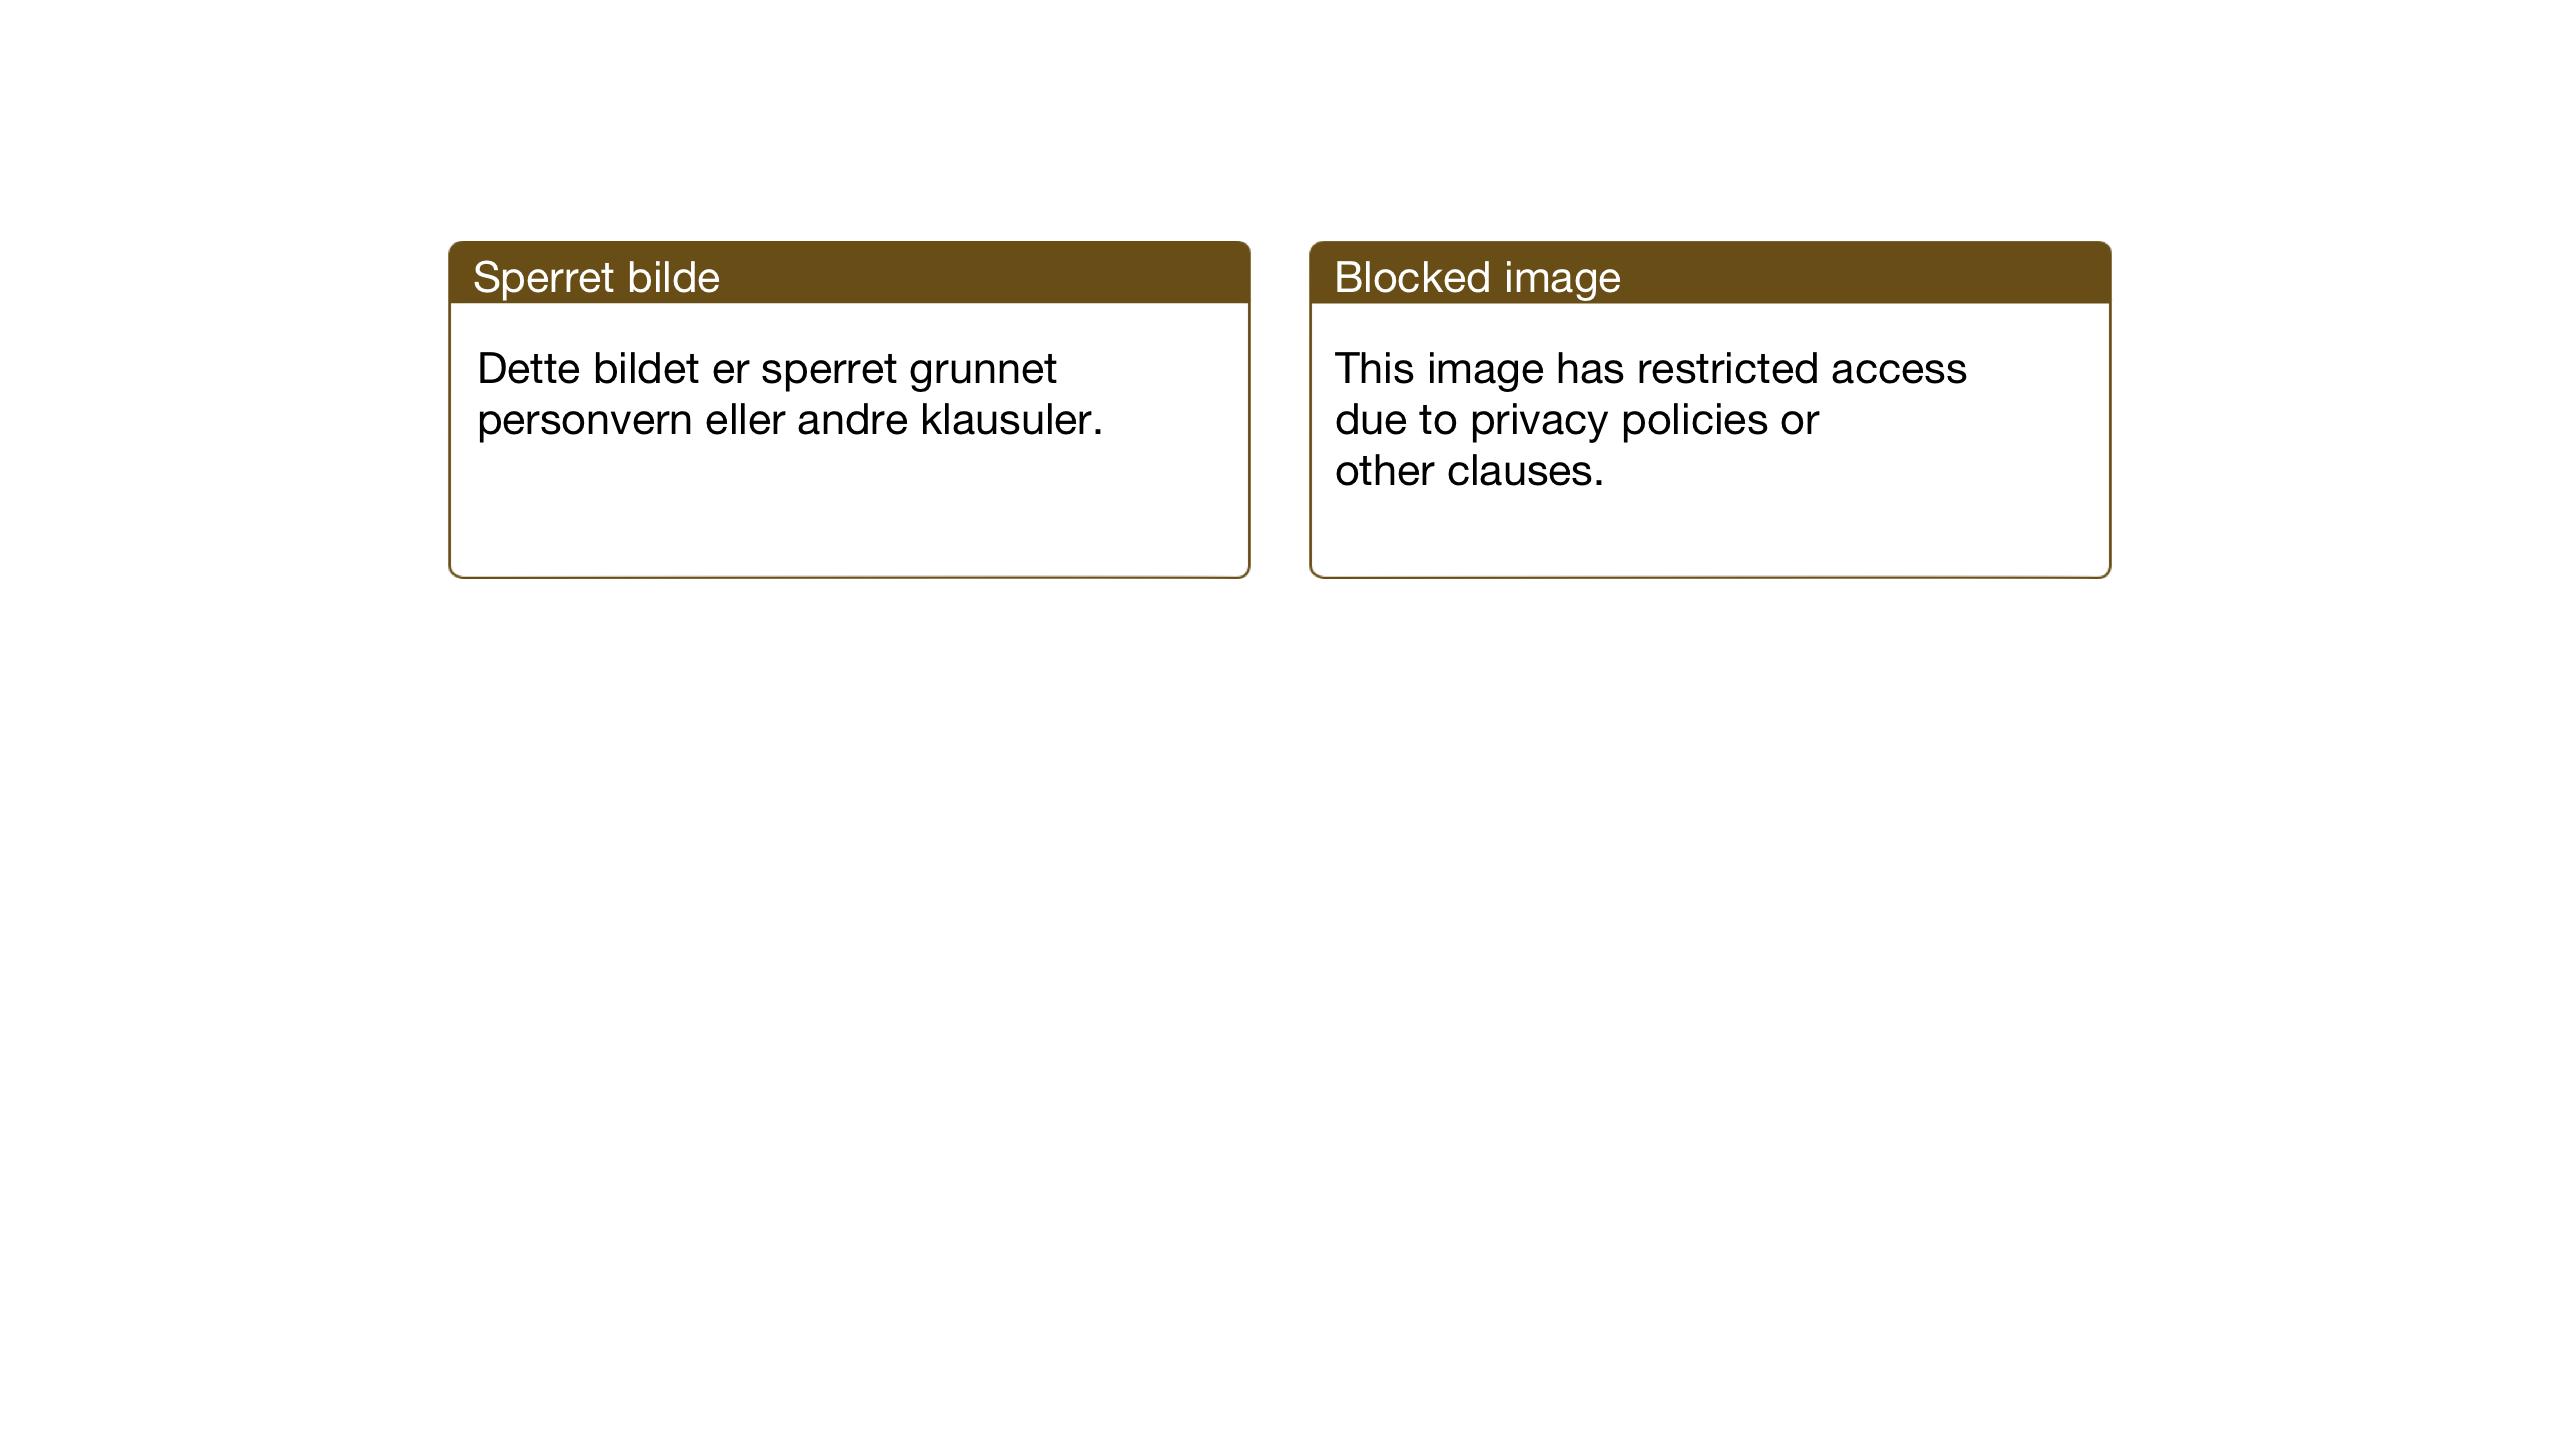 SAT, Ministerialprotokoller, klokkerbøker og fødselsregistre - Sør-Trøndelag, 653/L0658: Parish register (copy) no. 653C02, 1919-1947, p. 223